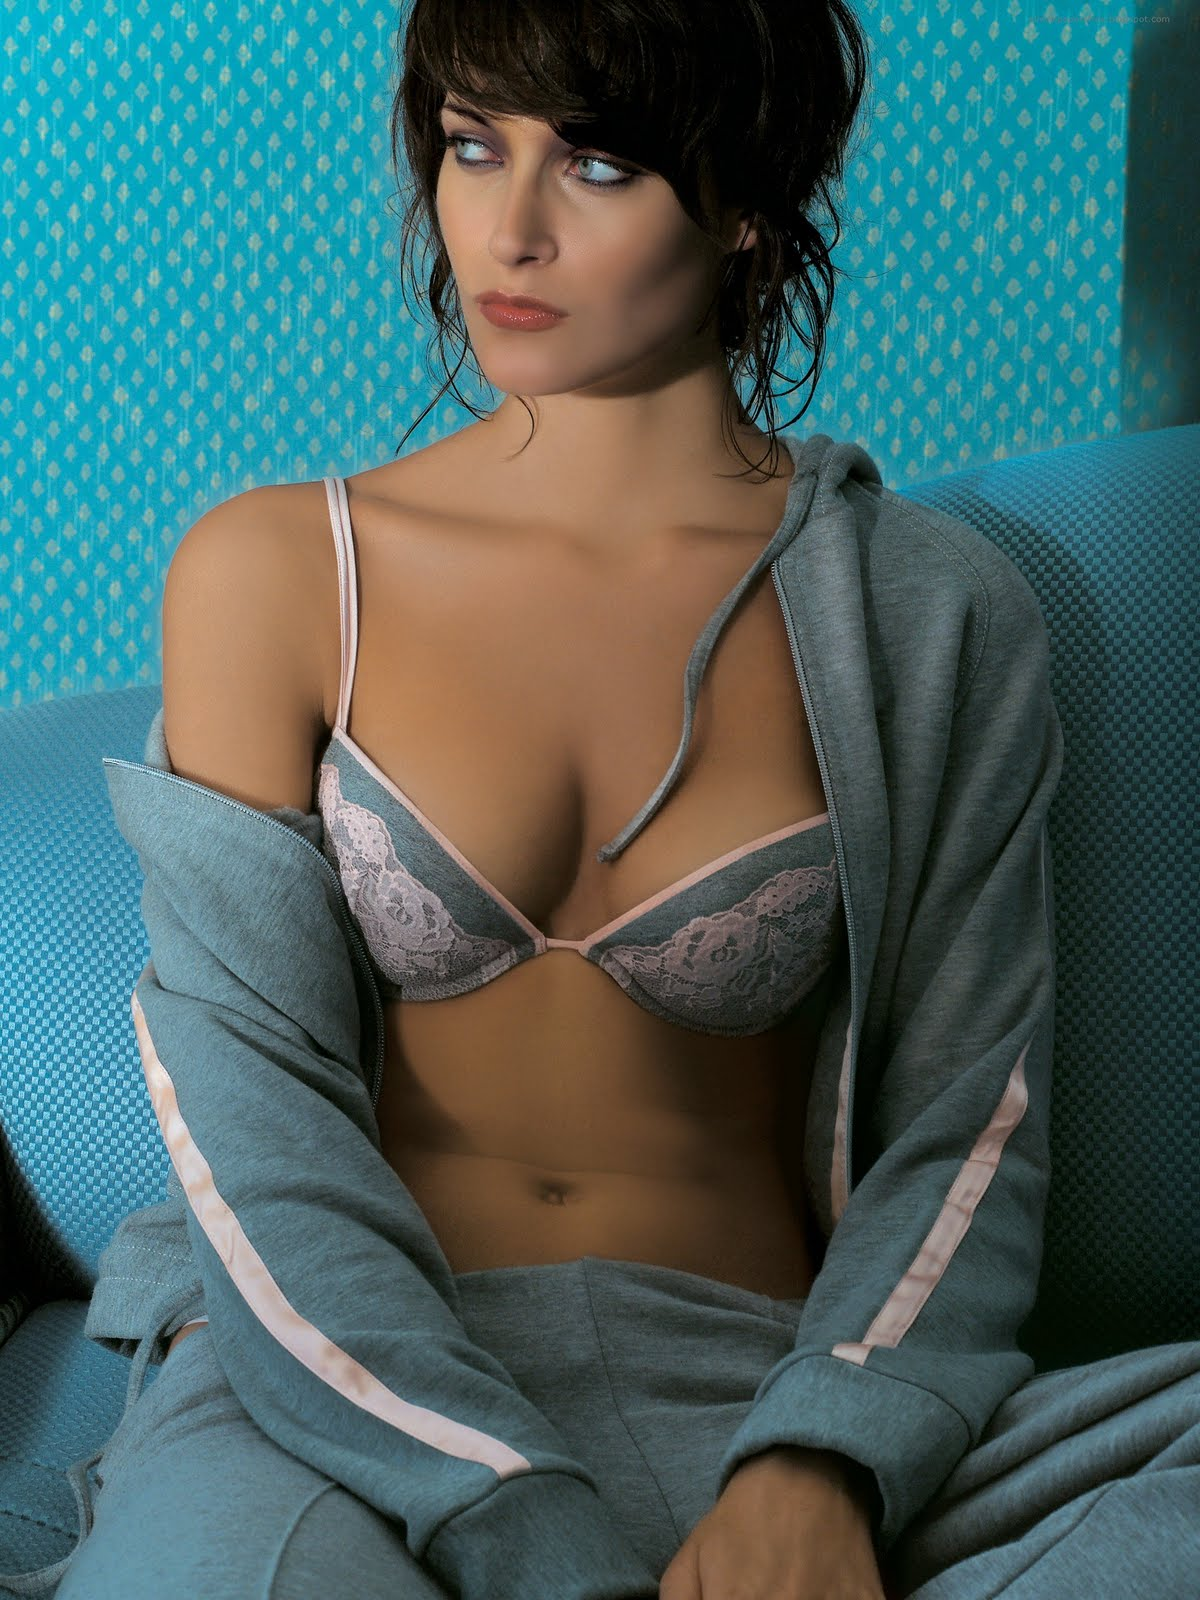 Putri mendem: Hot Celebrities Bra Collection Pictures Photos